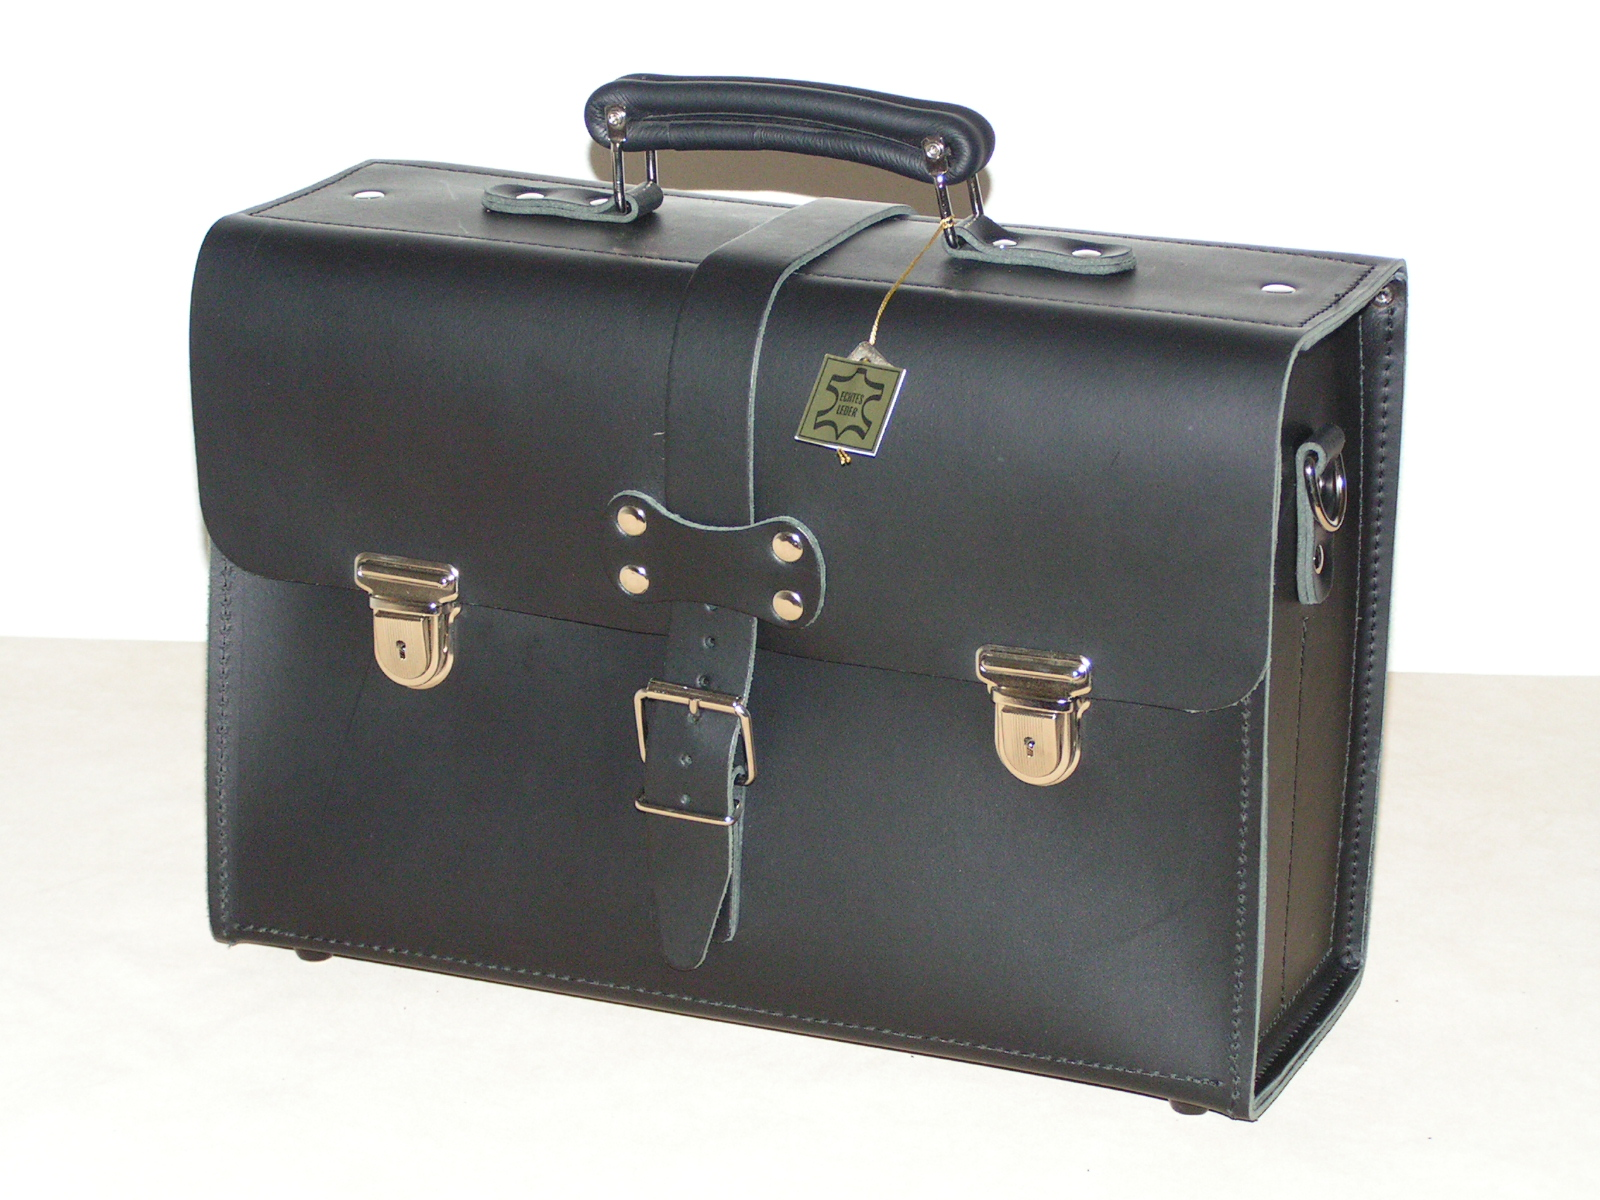 Fahrertasche Nr. 803 Rindleder schwarz